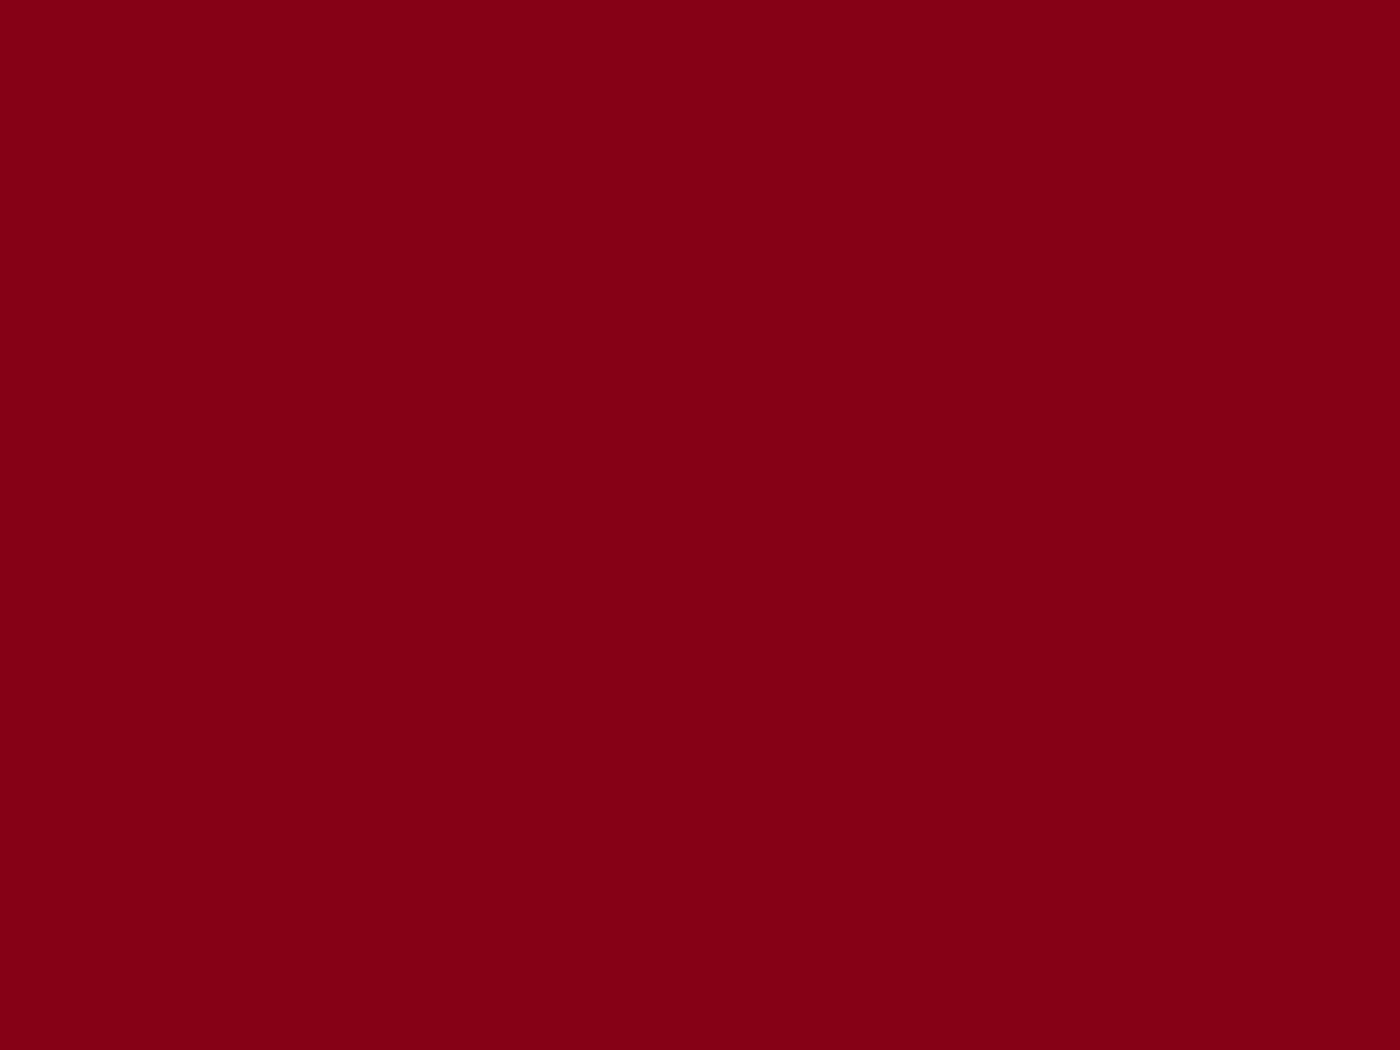 1400x1050 Red Devil Solid Color Background